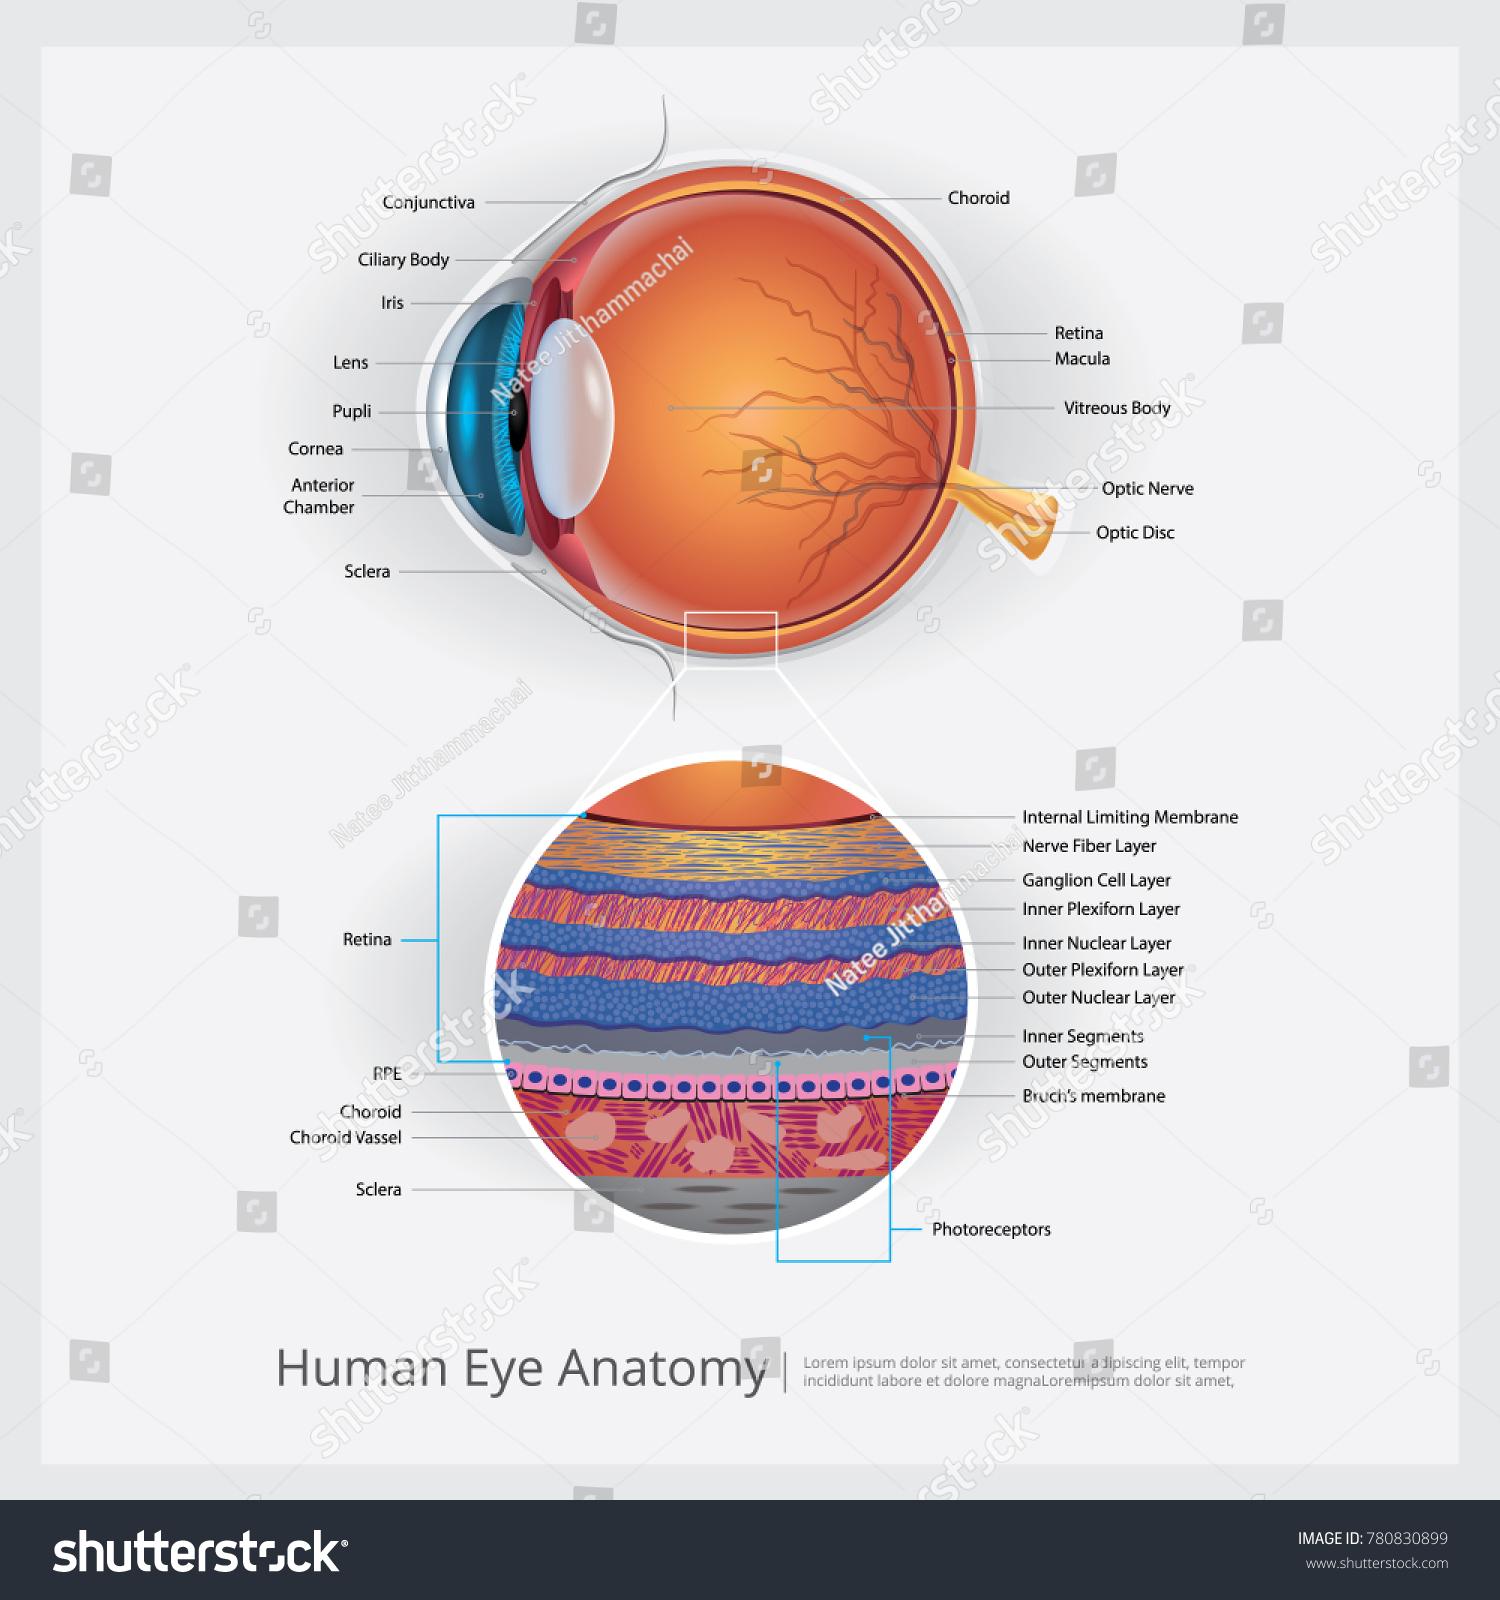 Human Eye Anatomy Vector Illustration Stock Vector (Royalty Free ...